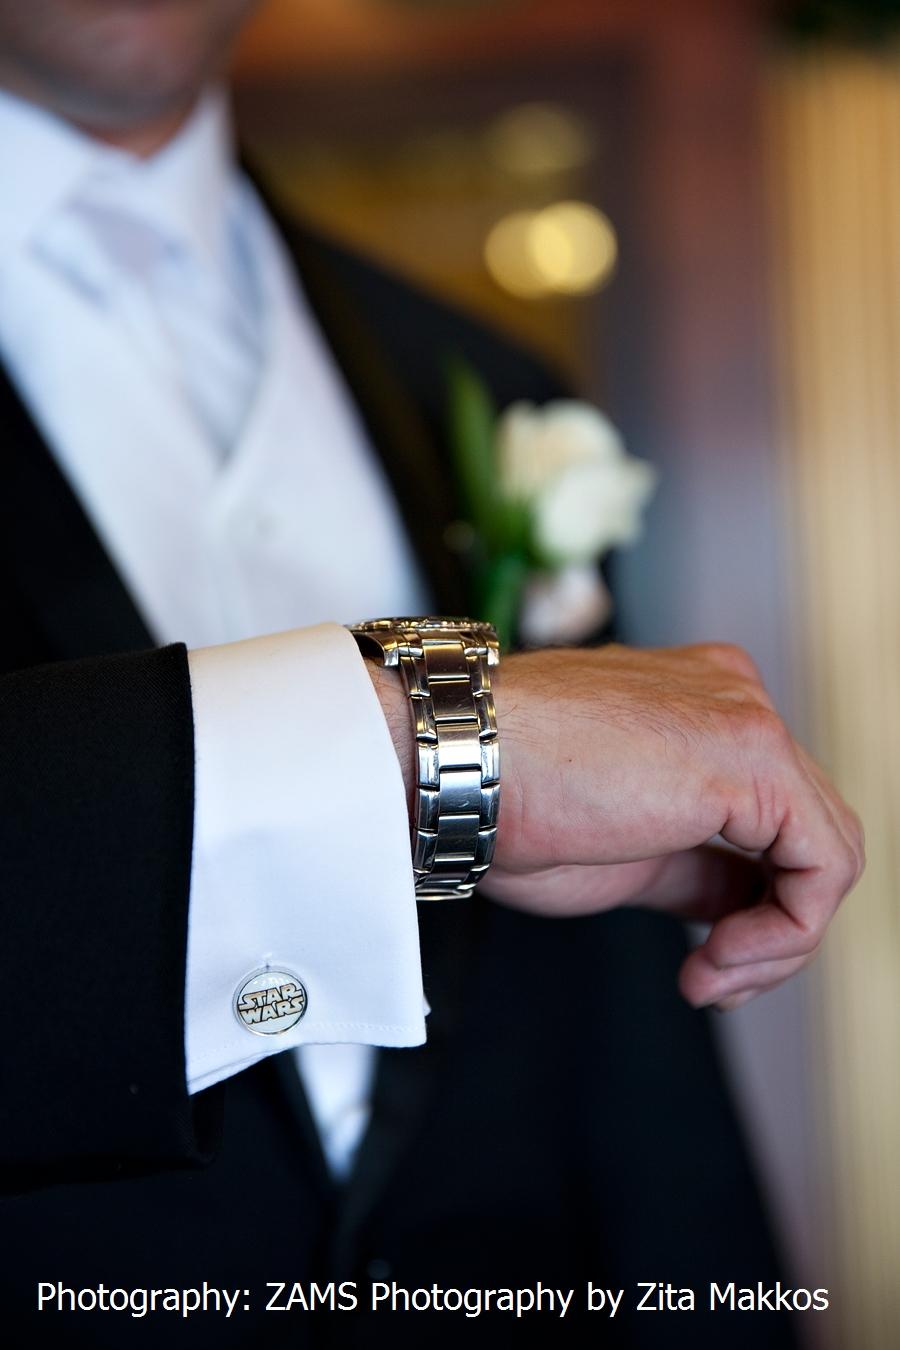 satan_inside_cuff_links_men_wedding_groomsmen_groom_cufflinks_2.jpg